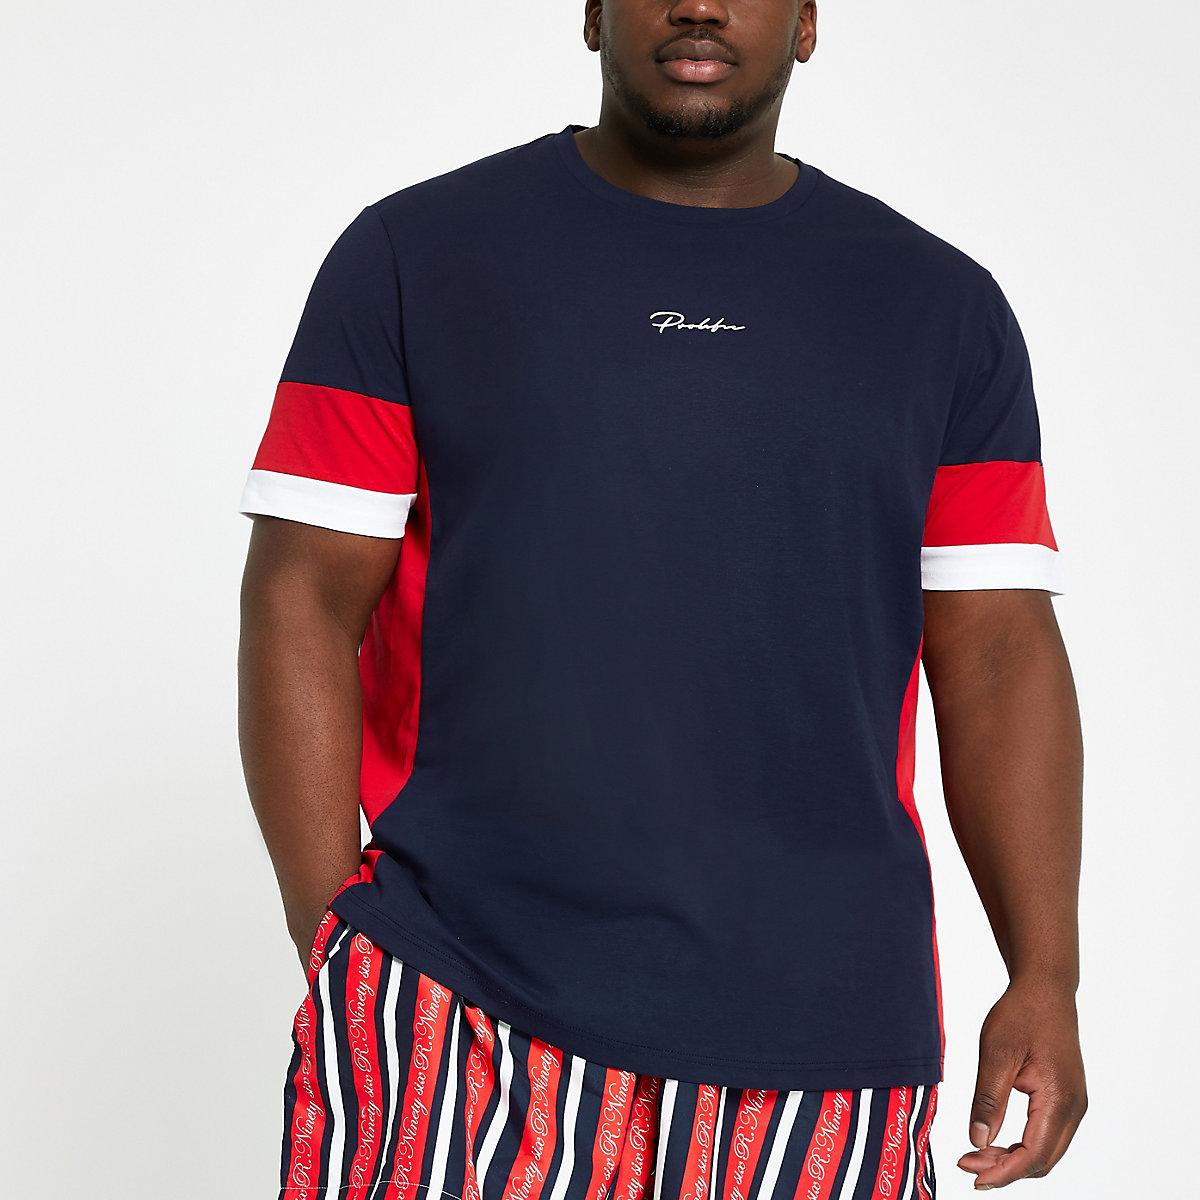 Big and Tall navy 'Prolific' T-shirt